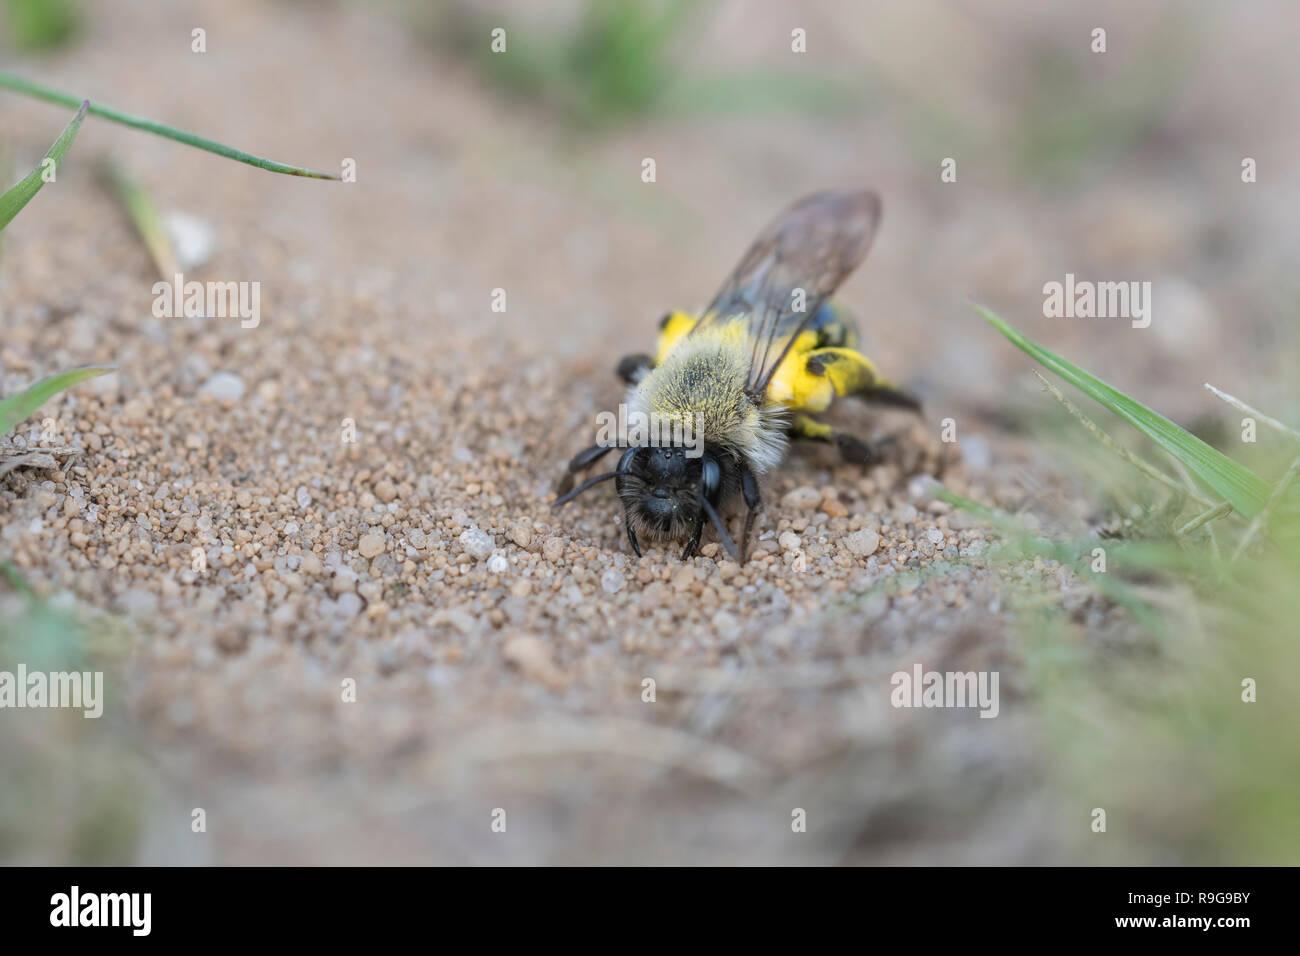 Weidensandbiene, Andrena vaga, Sandy Bee - Stock Image